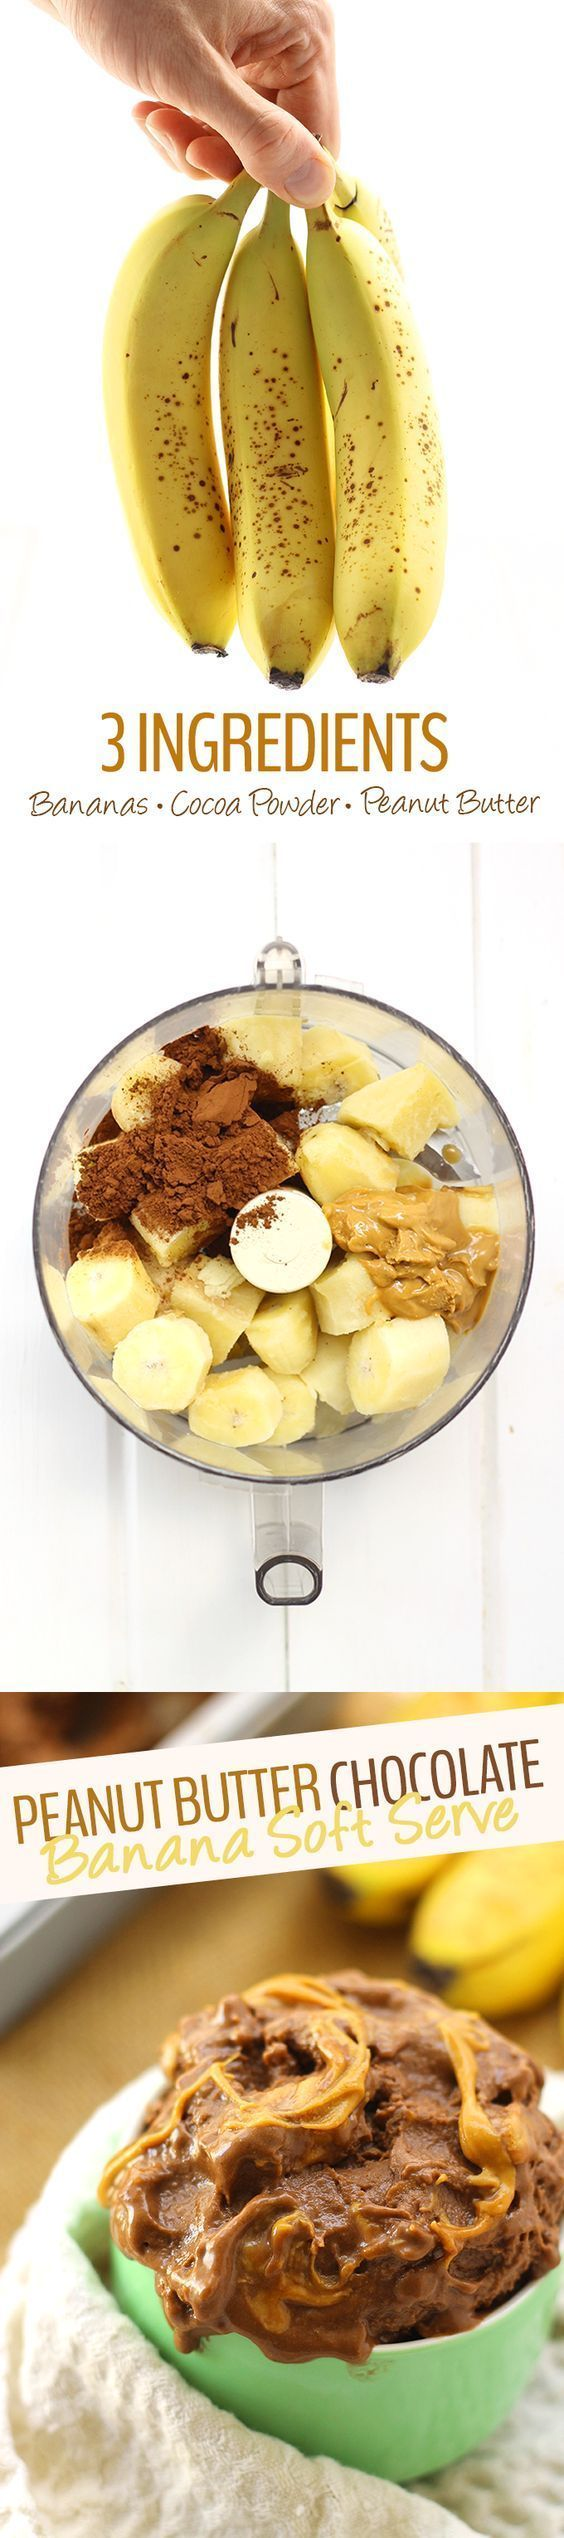 Peanut Butter Chocolate Banana Soft Serve